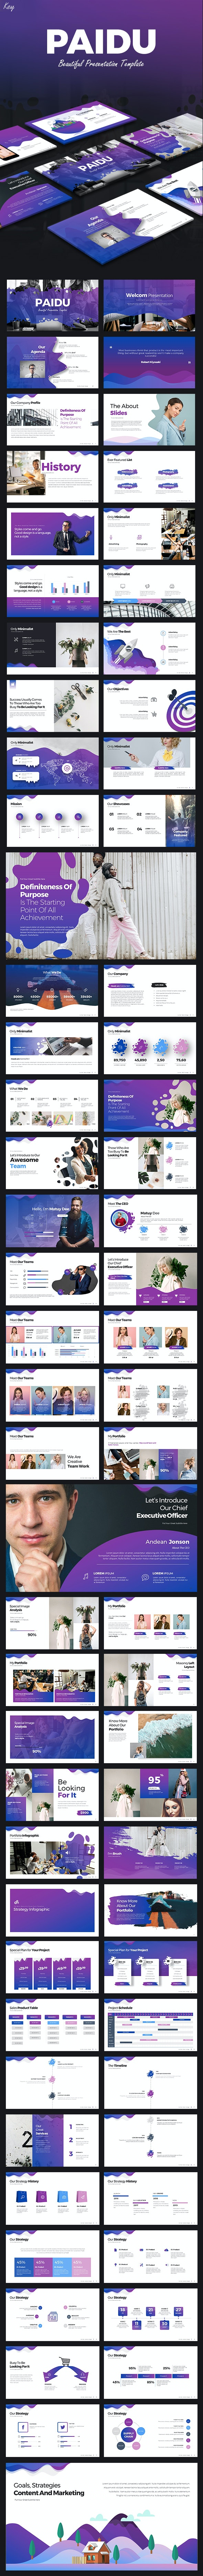 Paidu  Keynote Presentation - Keynote Templates Presentation Templates